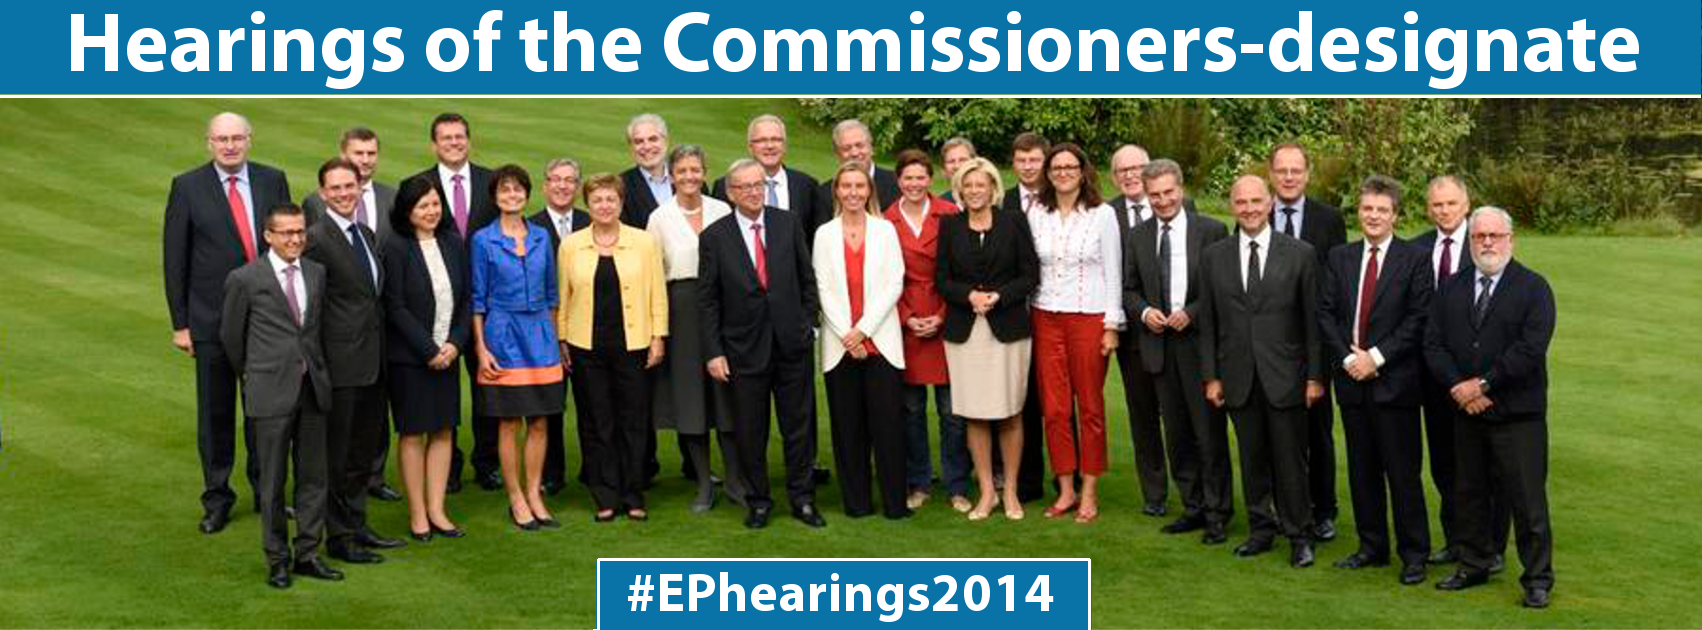 In Focus: Hearings of the Commissioners-designate